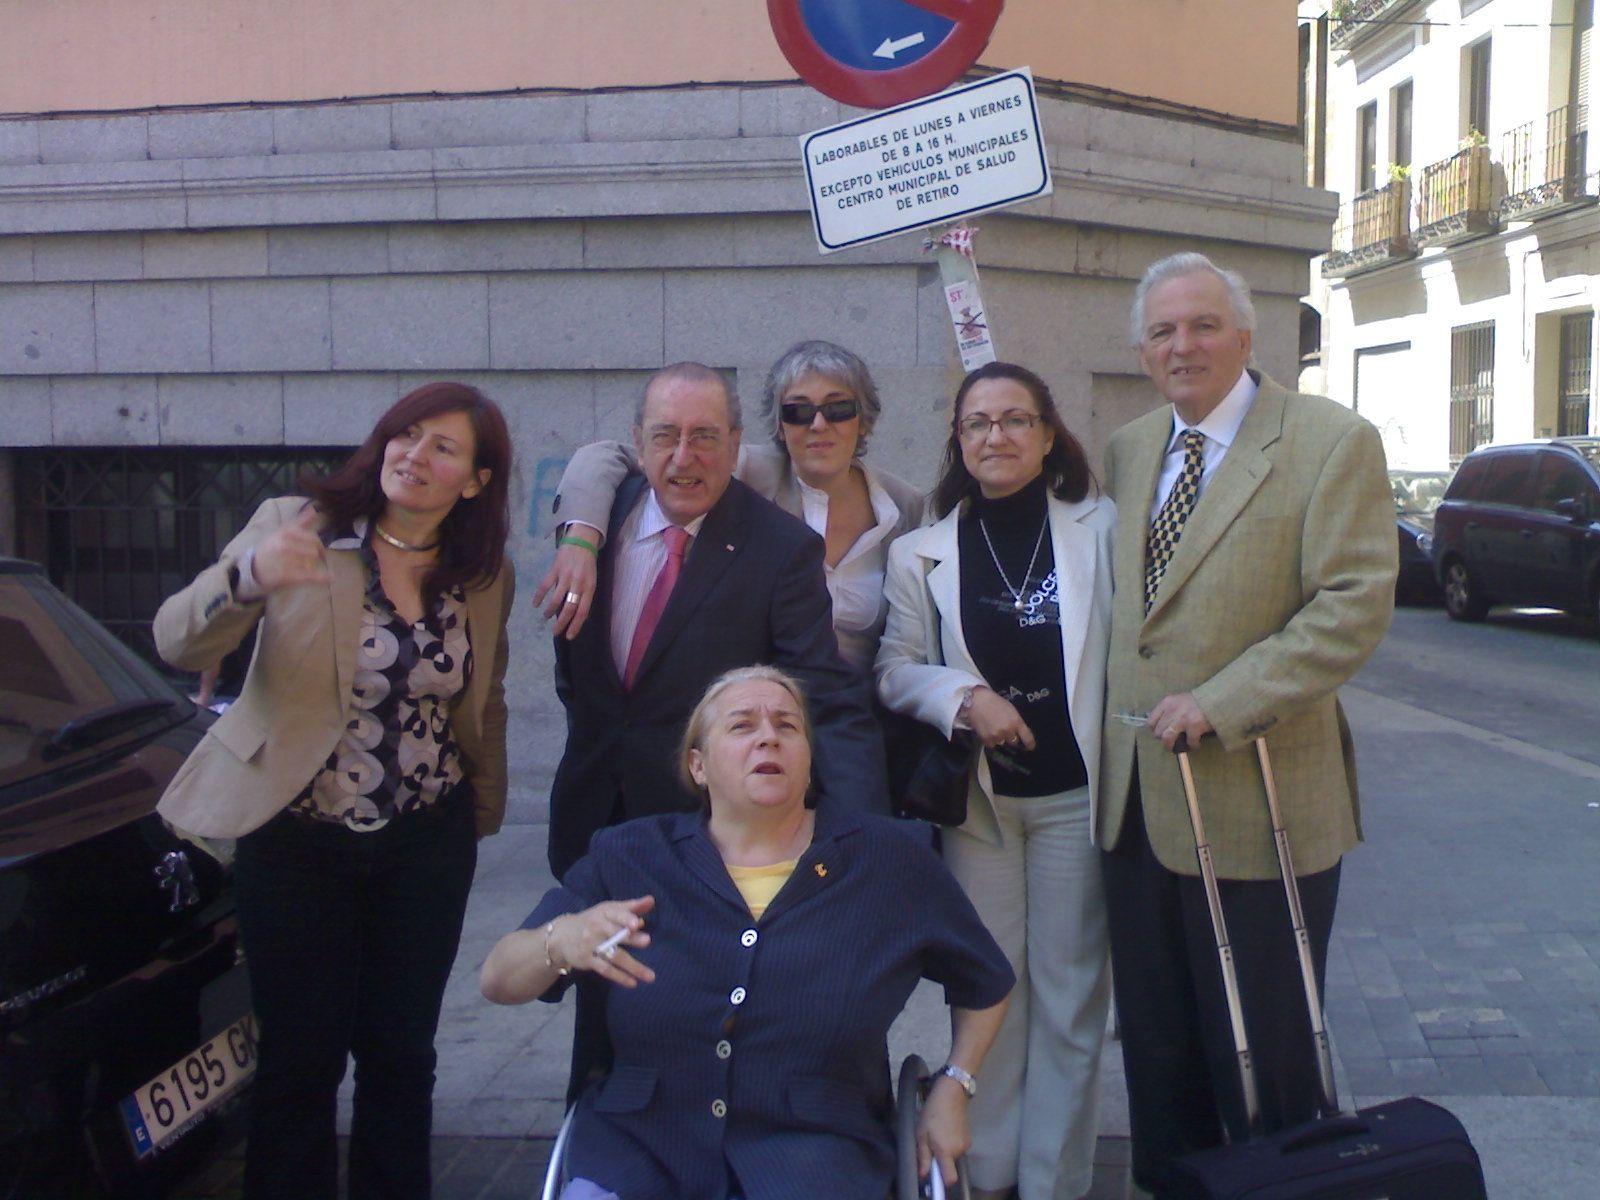 Juan de Dios Ramírez Heredia, Yolanda Besteiro, Juan Lara y Roser Romero